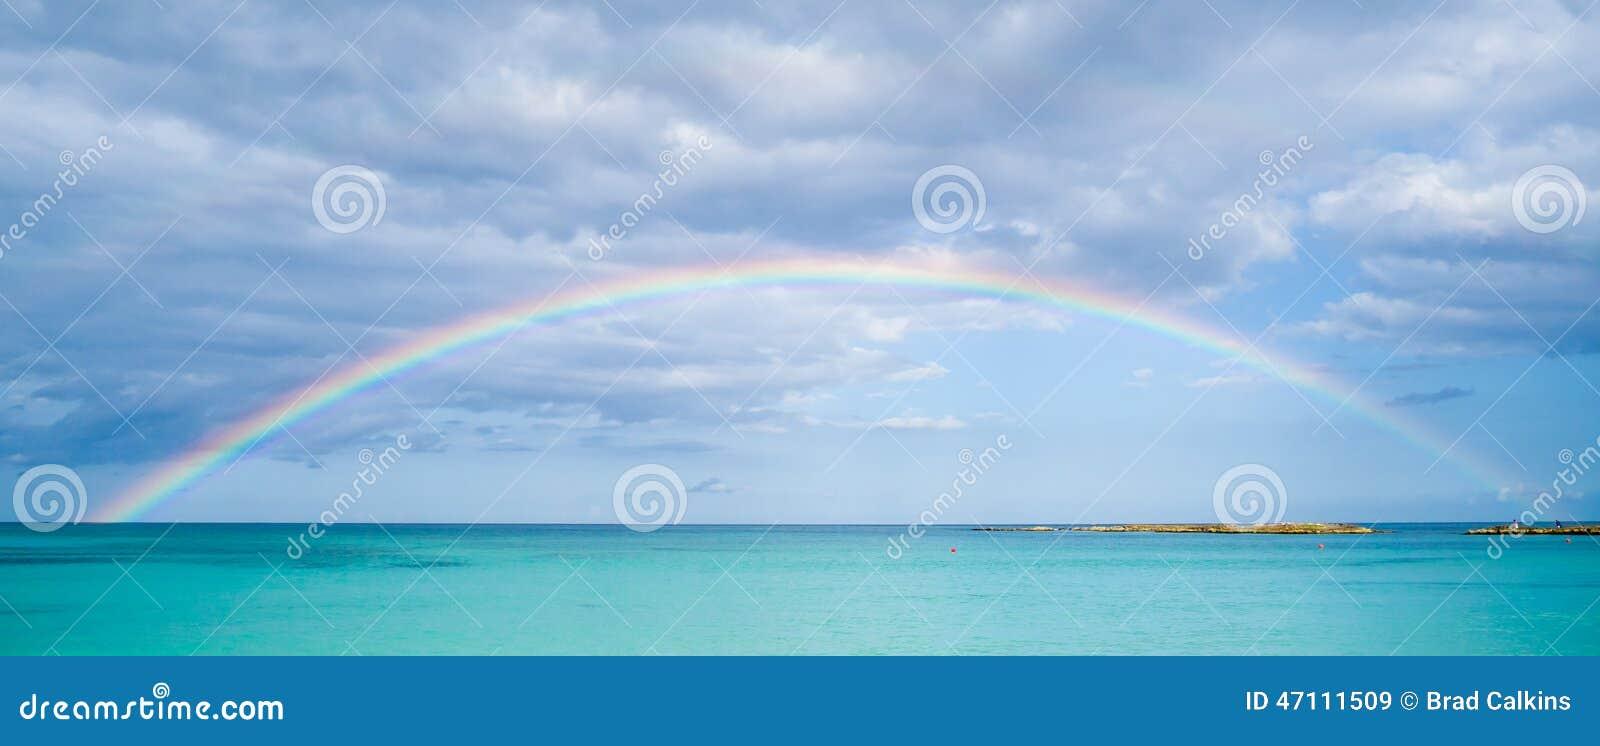 Regenbogen über Ozean